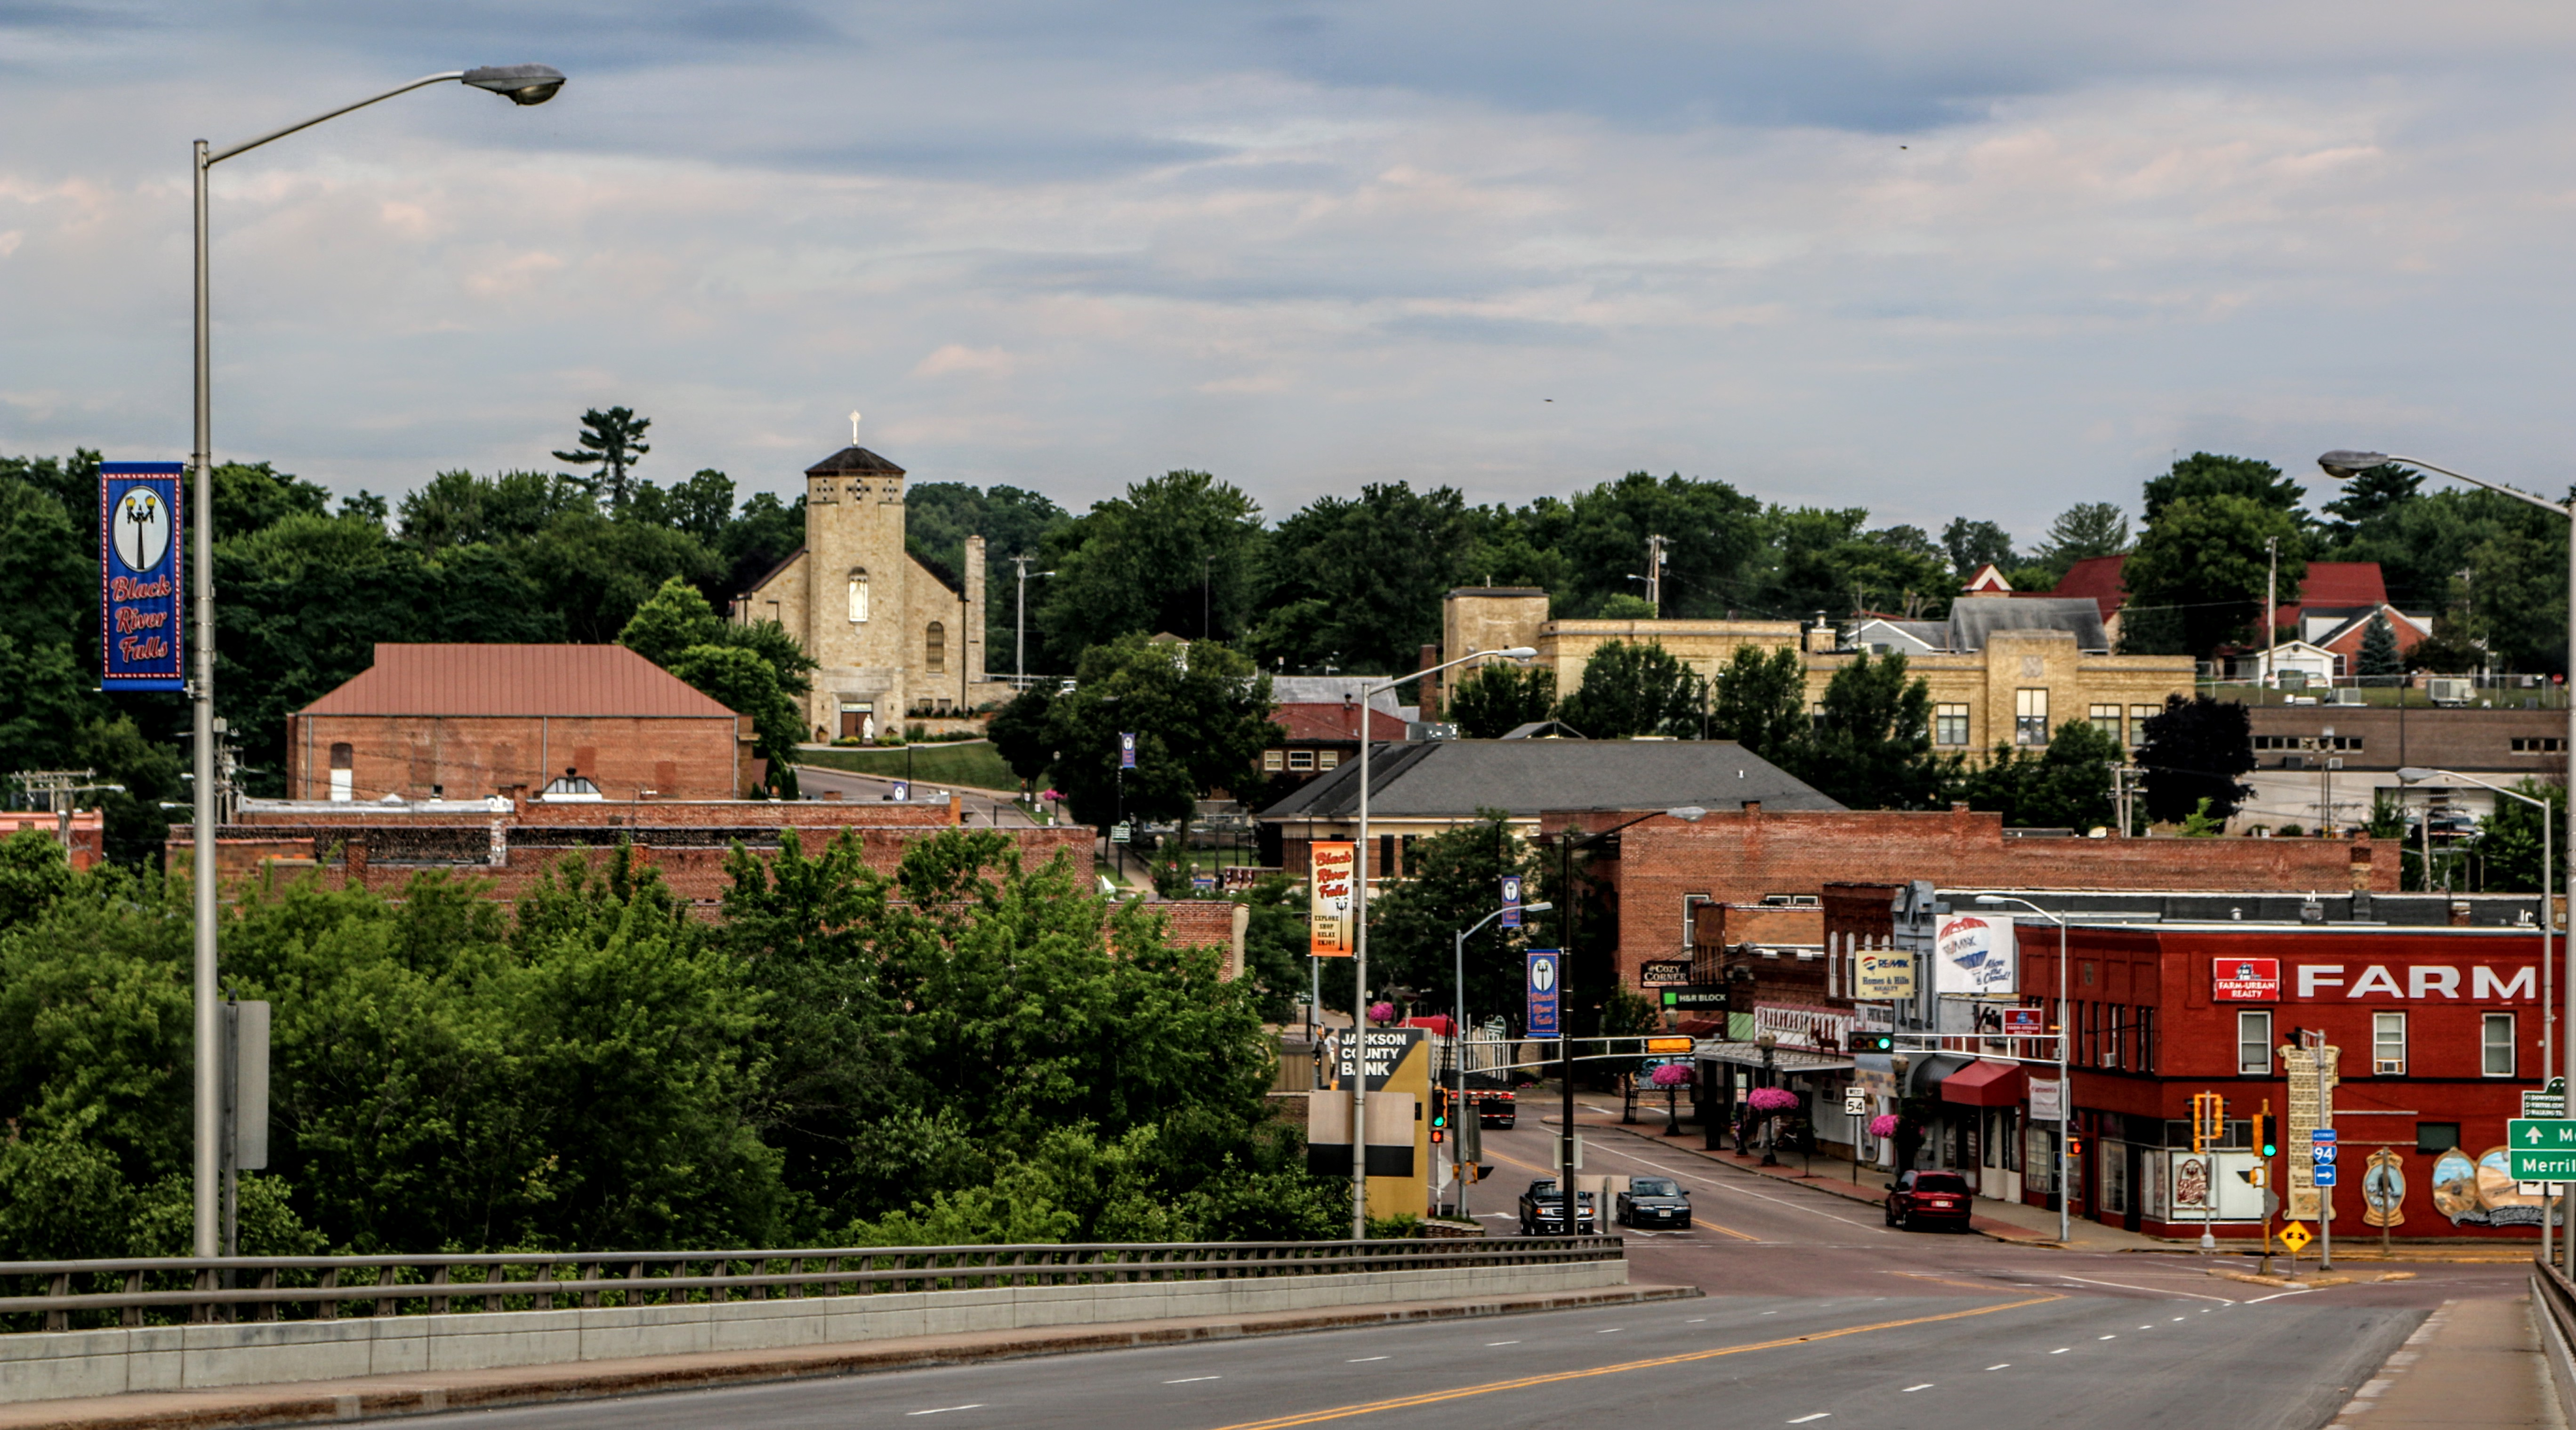 Downtown Black River Falls, Wisconsin